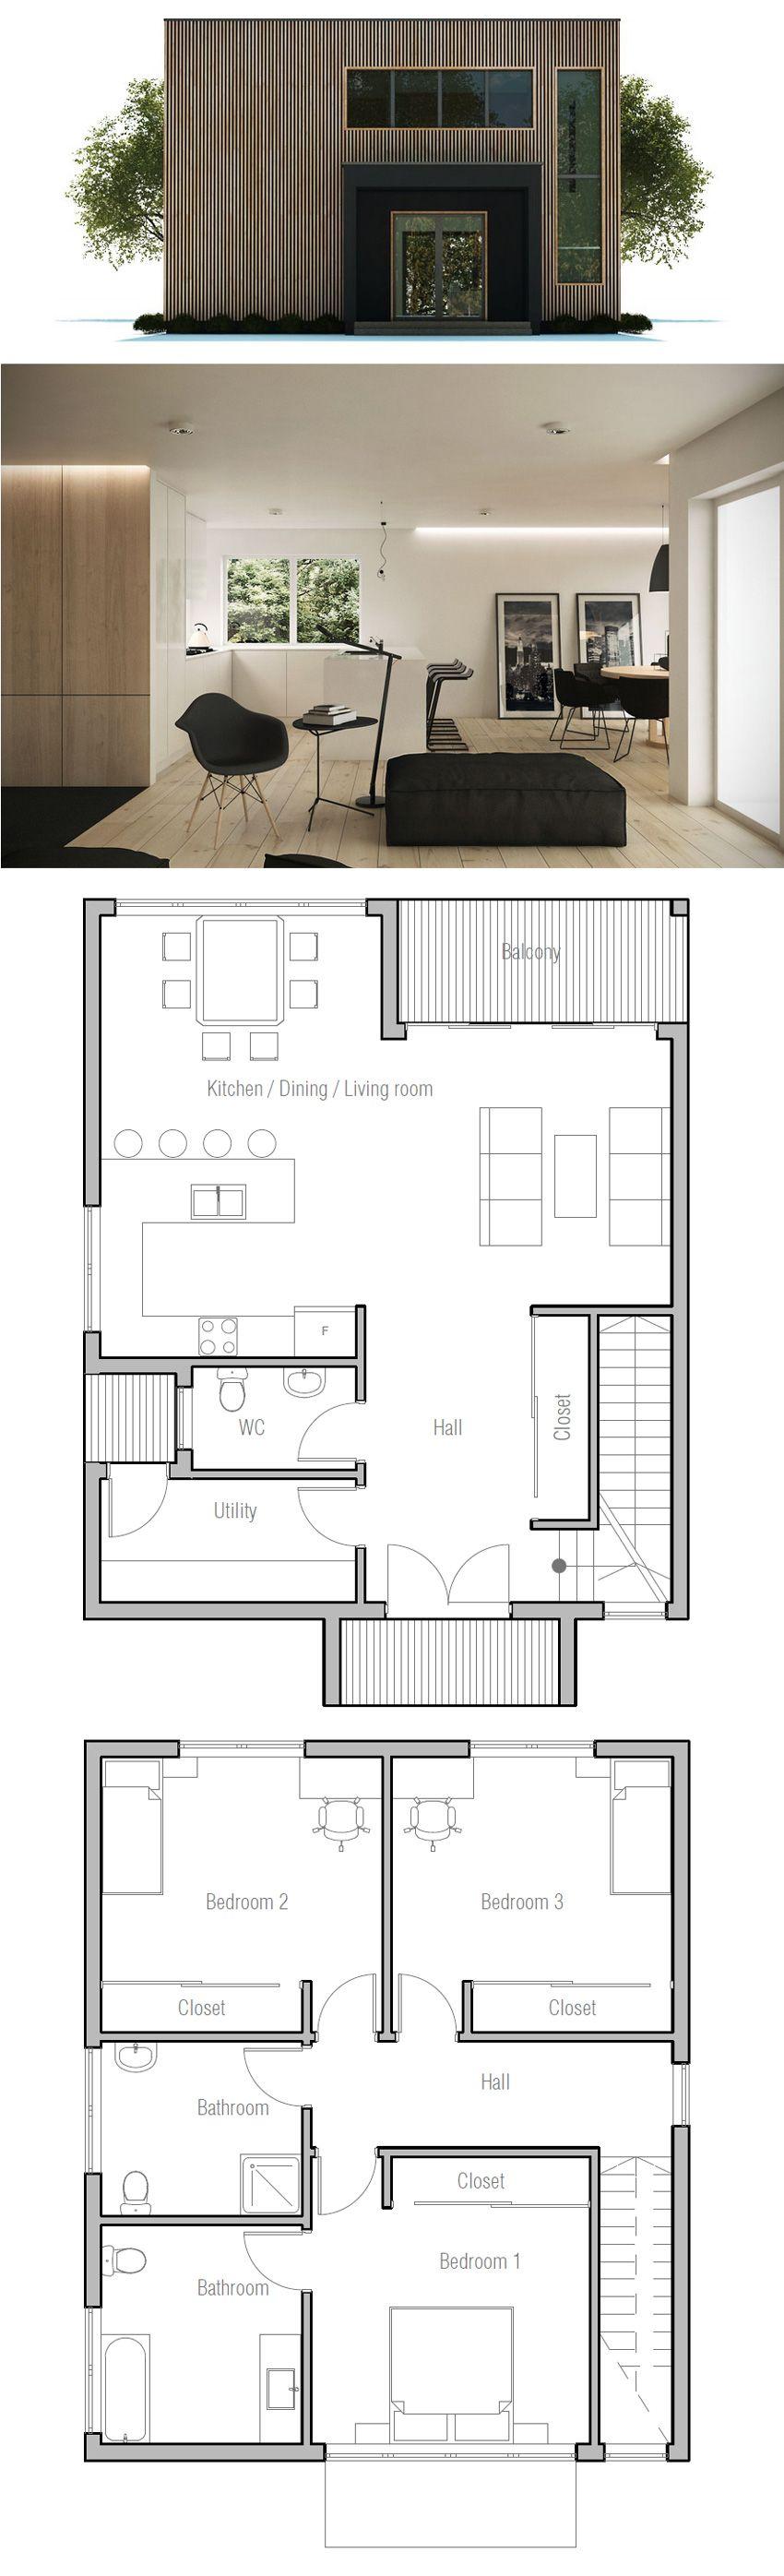 small house plan small house plans haus pl ne haus haus architektur. Black Bedroom Furniture Sets. Home Design Ideas